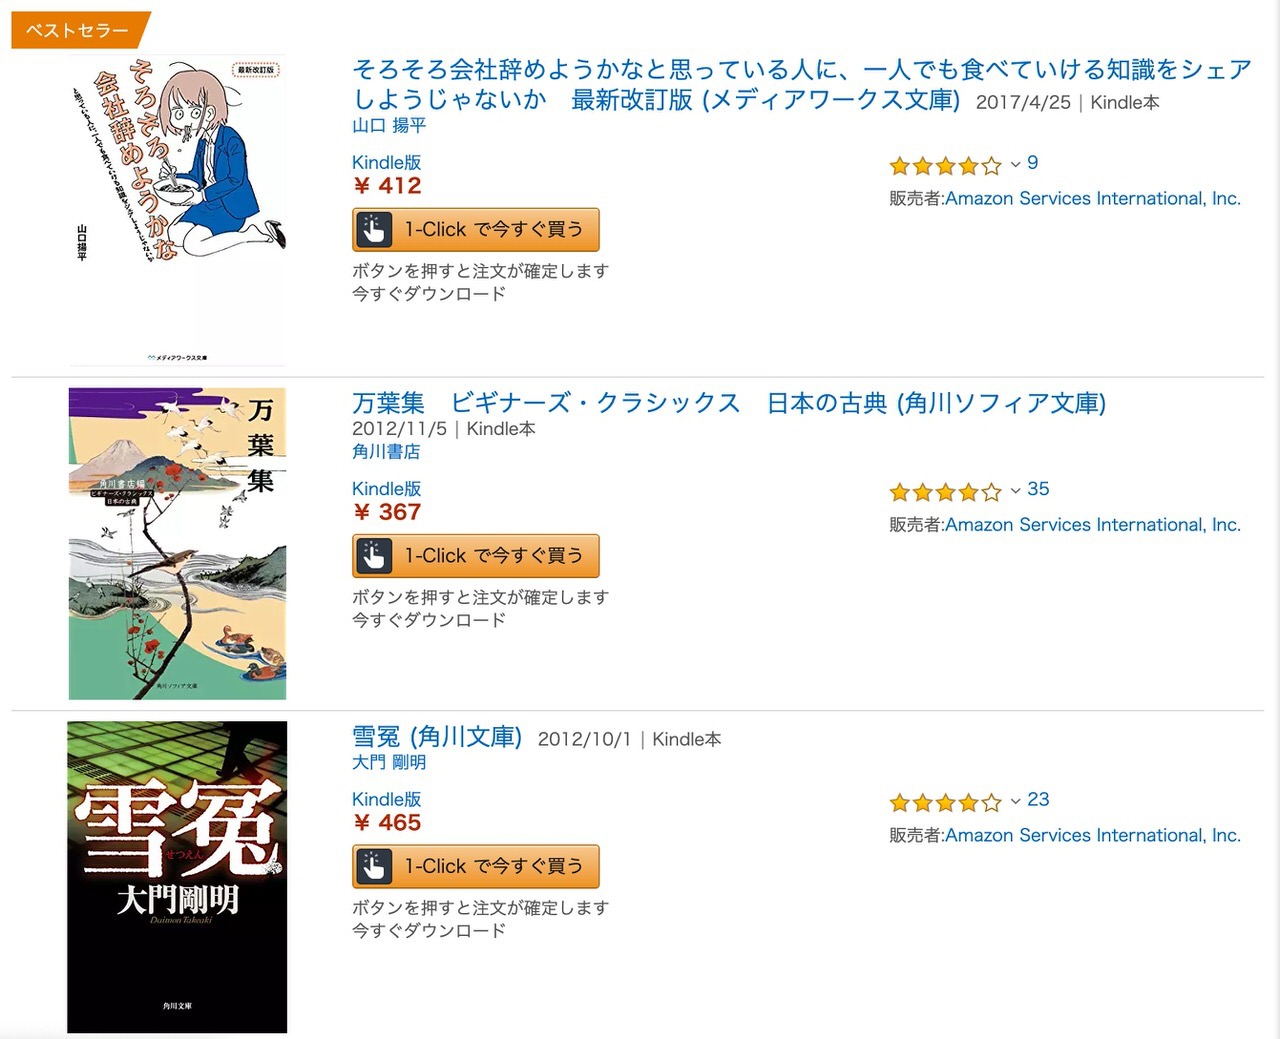 【Kindleセール】2,000冊以上が対象のKADOKAWA「春の名作文芸書まつり」(5/23まで)